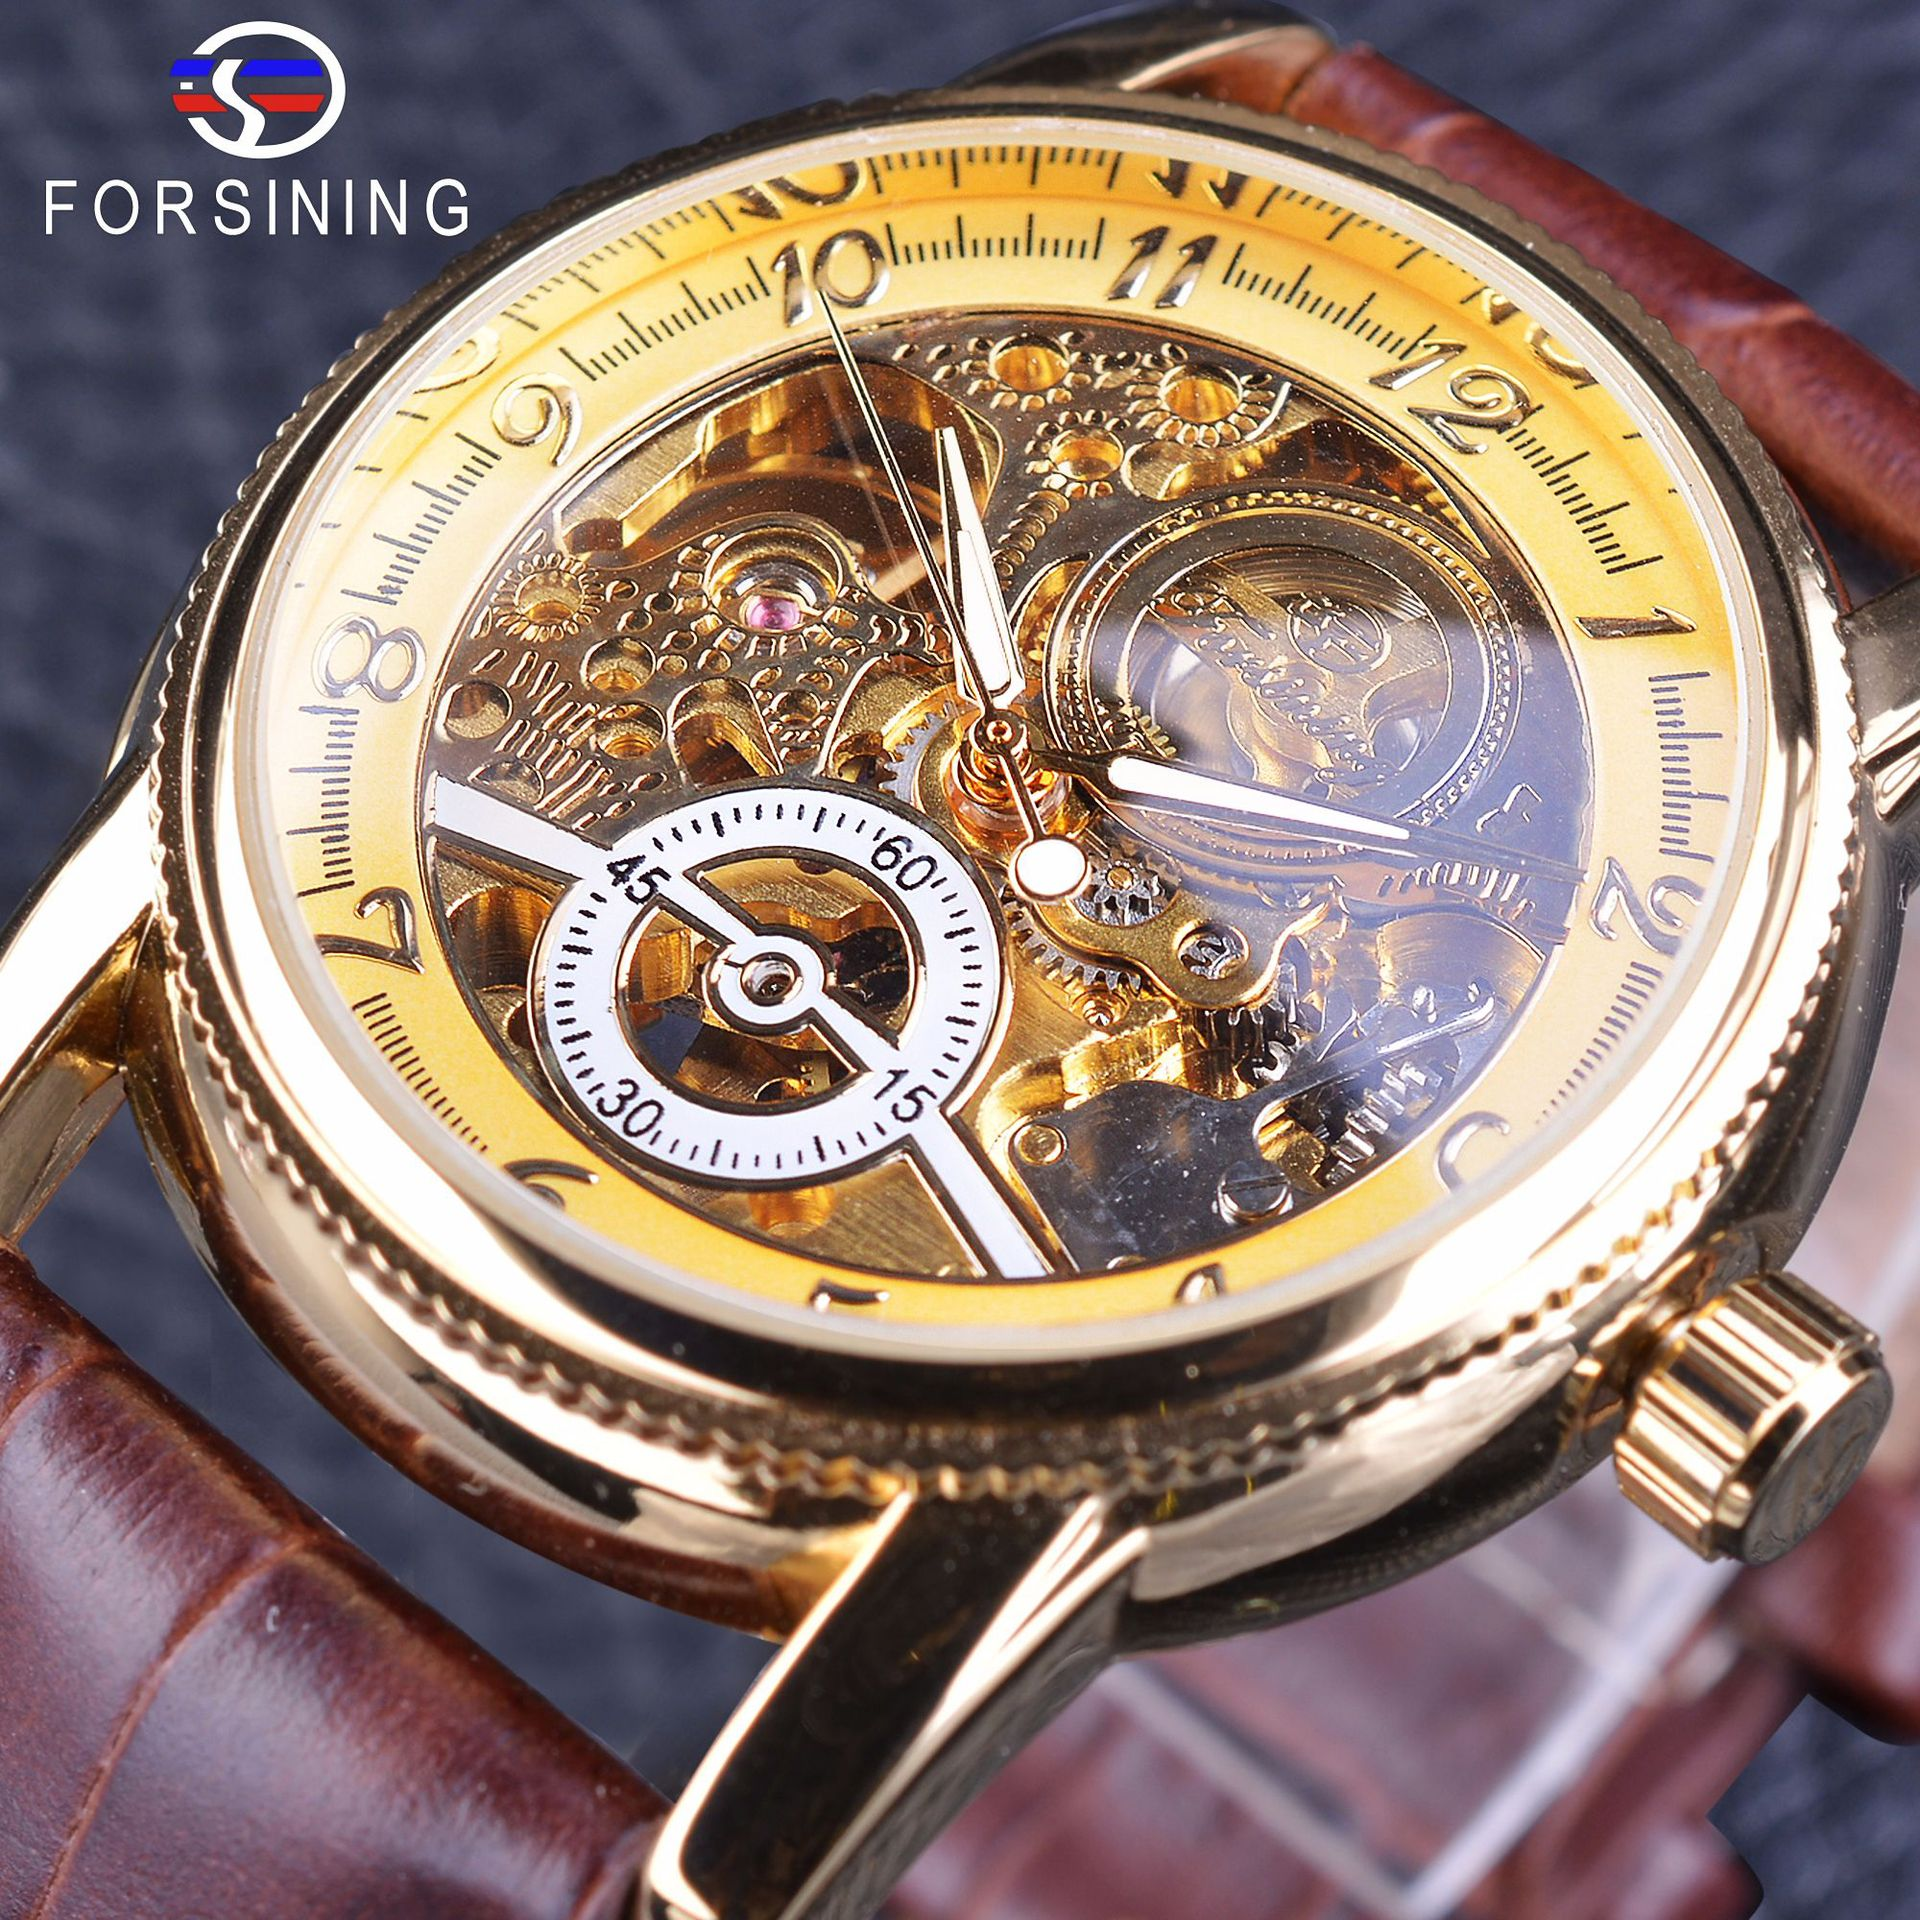 Marca Winner caja dorada de lujo diseño Casual correa de cuero marrón para hombre relojes huecos esqueleto mecánico transparente reloj